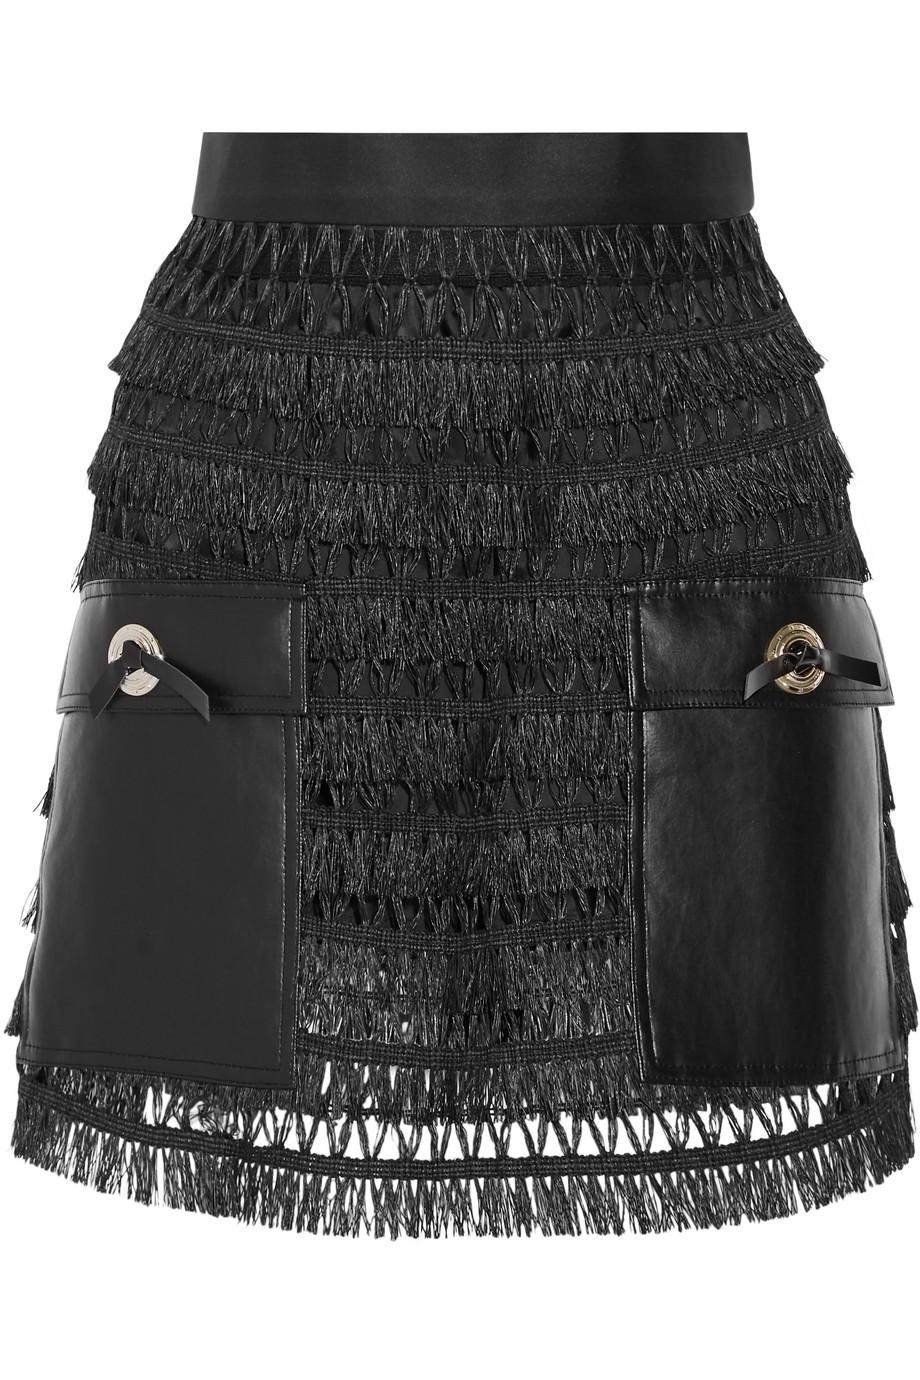 Toga Pulla Faux Leather-Paneled Fringed Cotton Mini Skirt, Black, Women's, Size: 36